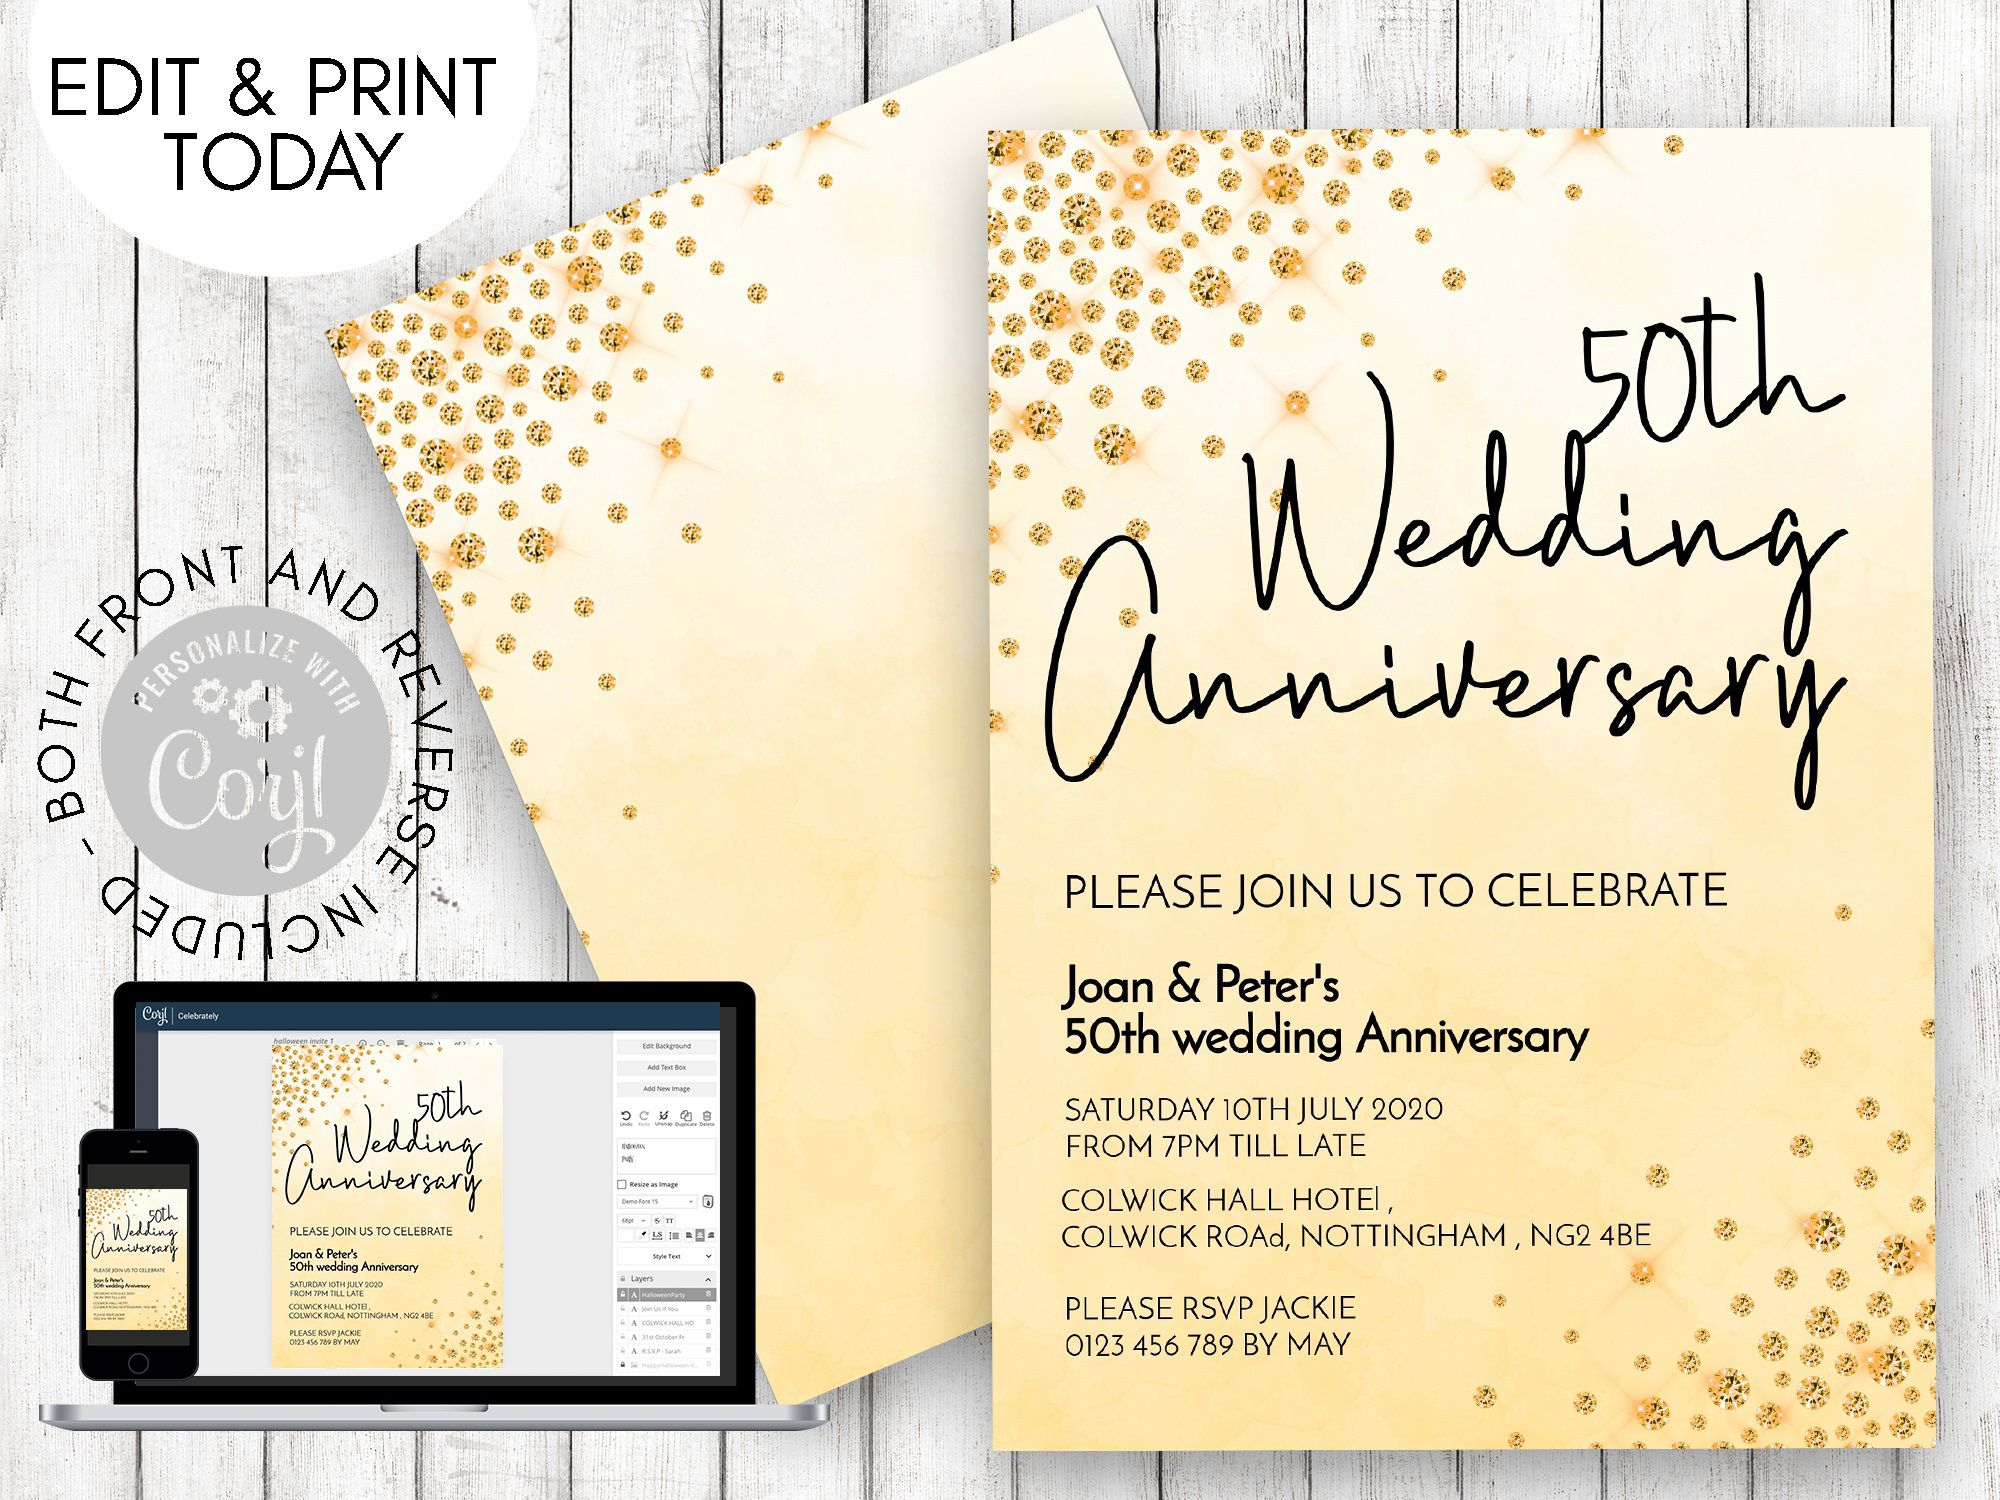 003 Rare 50th Anniversary Invitation Template Free Download High Resolution  Golden WeddingFull